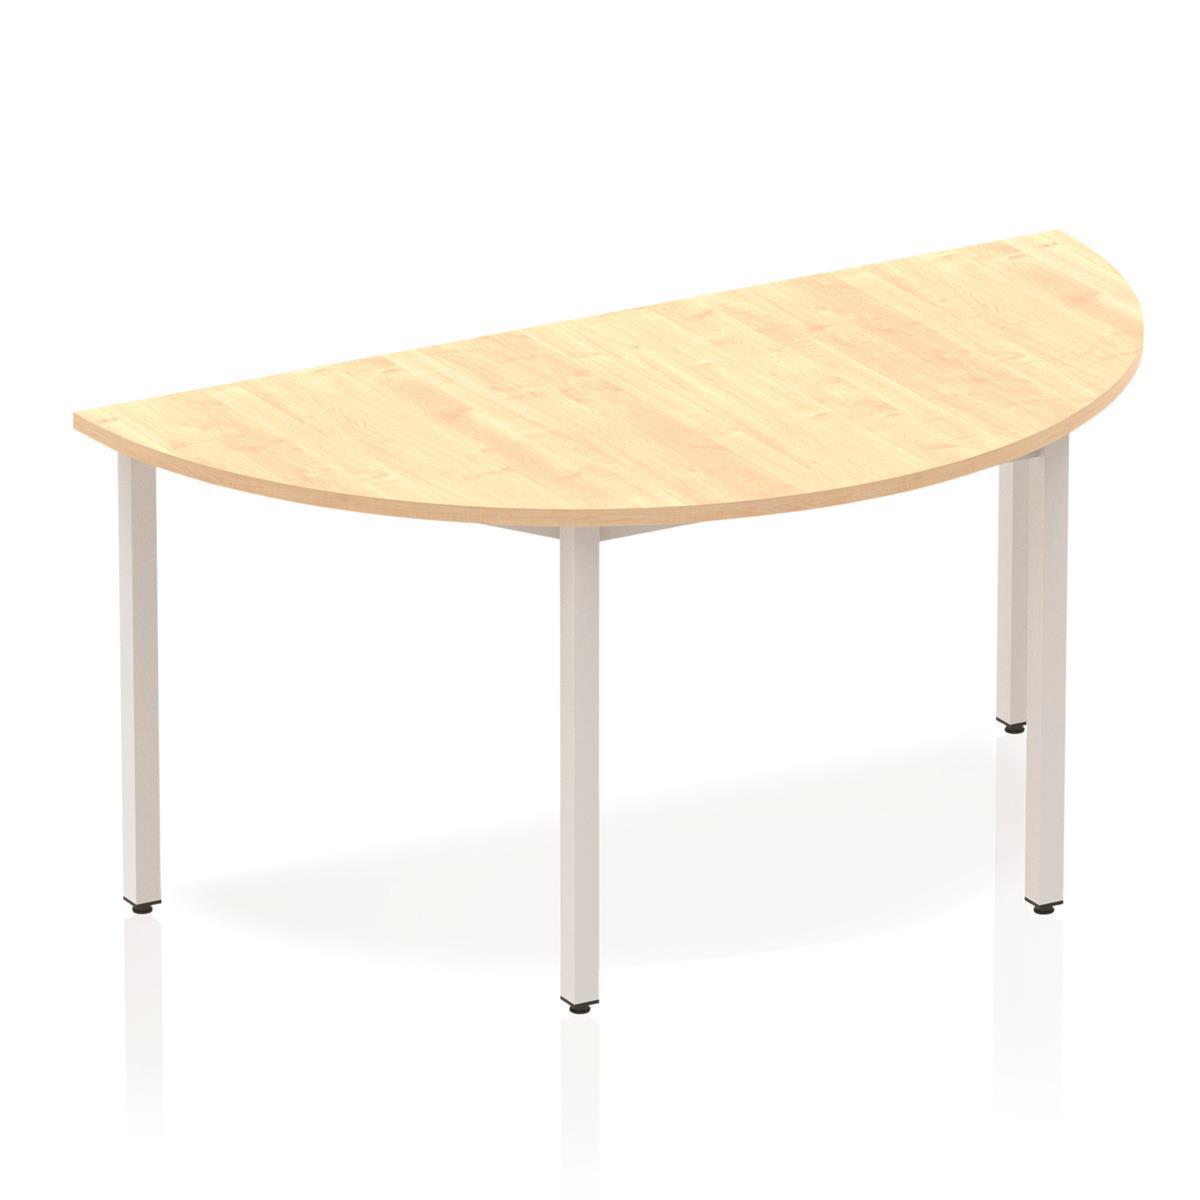 Trexus Semi-circular Box Frame Silver Leg Table 1600x800mm Maple Ref BF00164